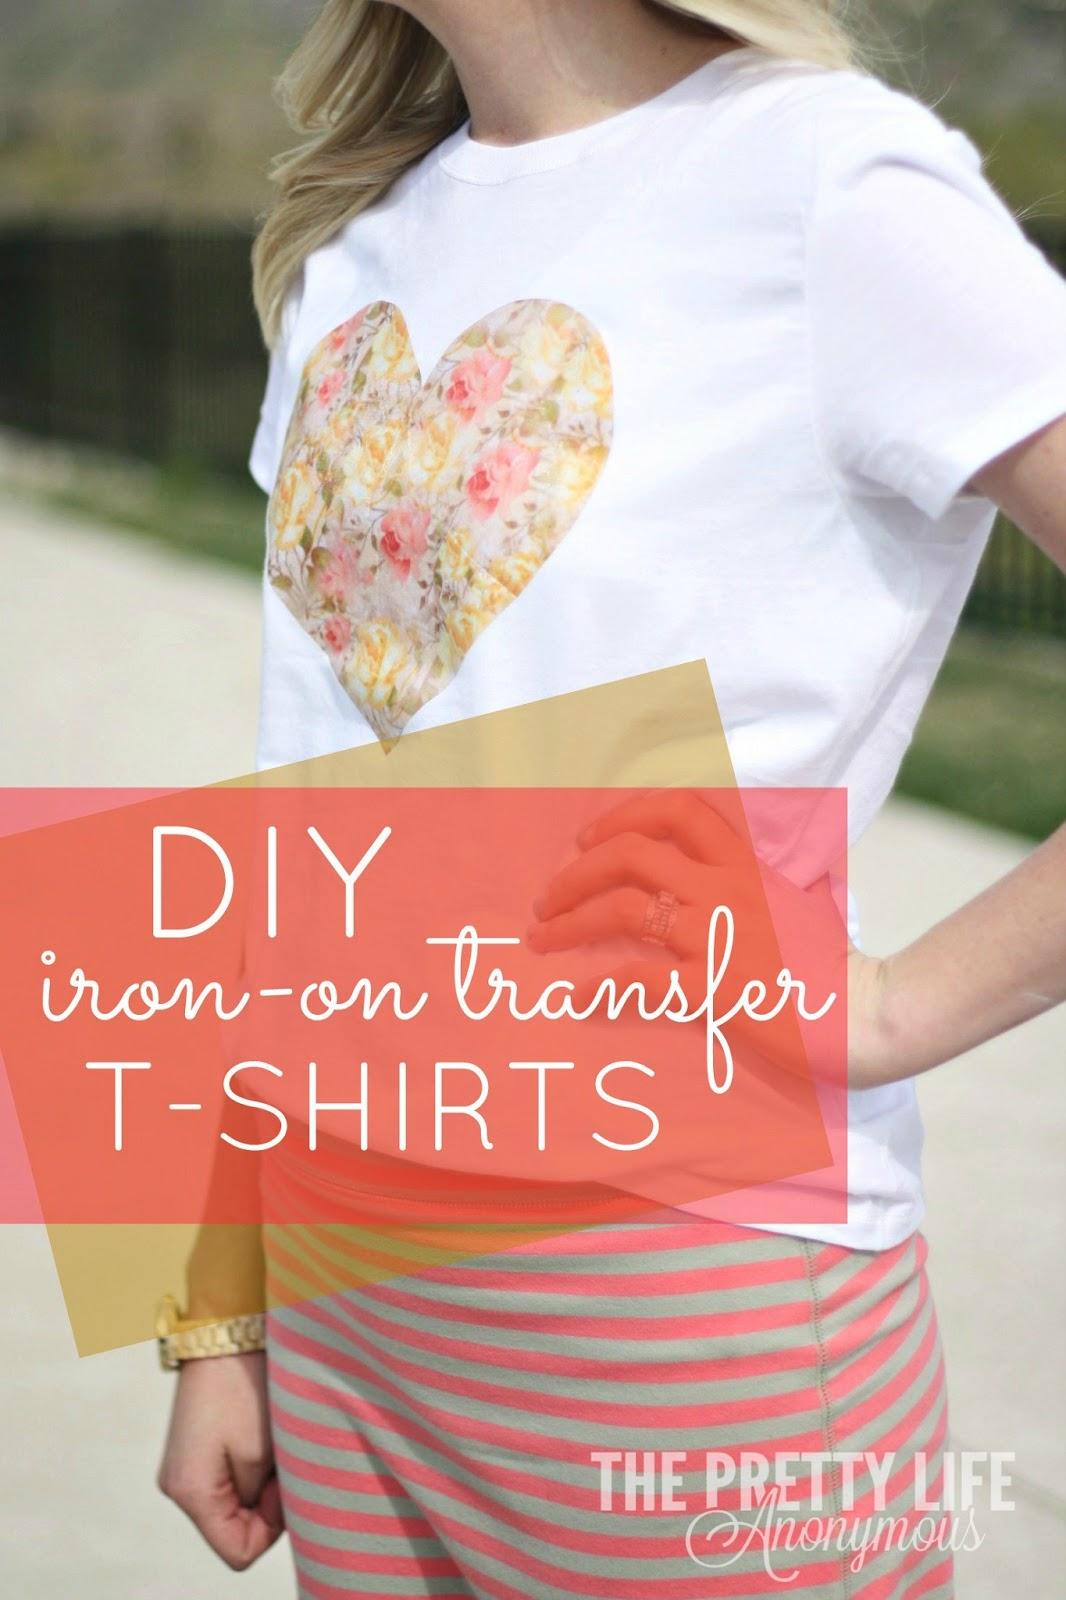 The Pretty Life Girls: PLA DIY: Iron-On Transfer Shirts ...